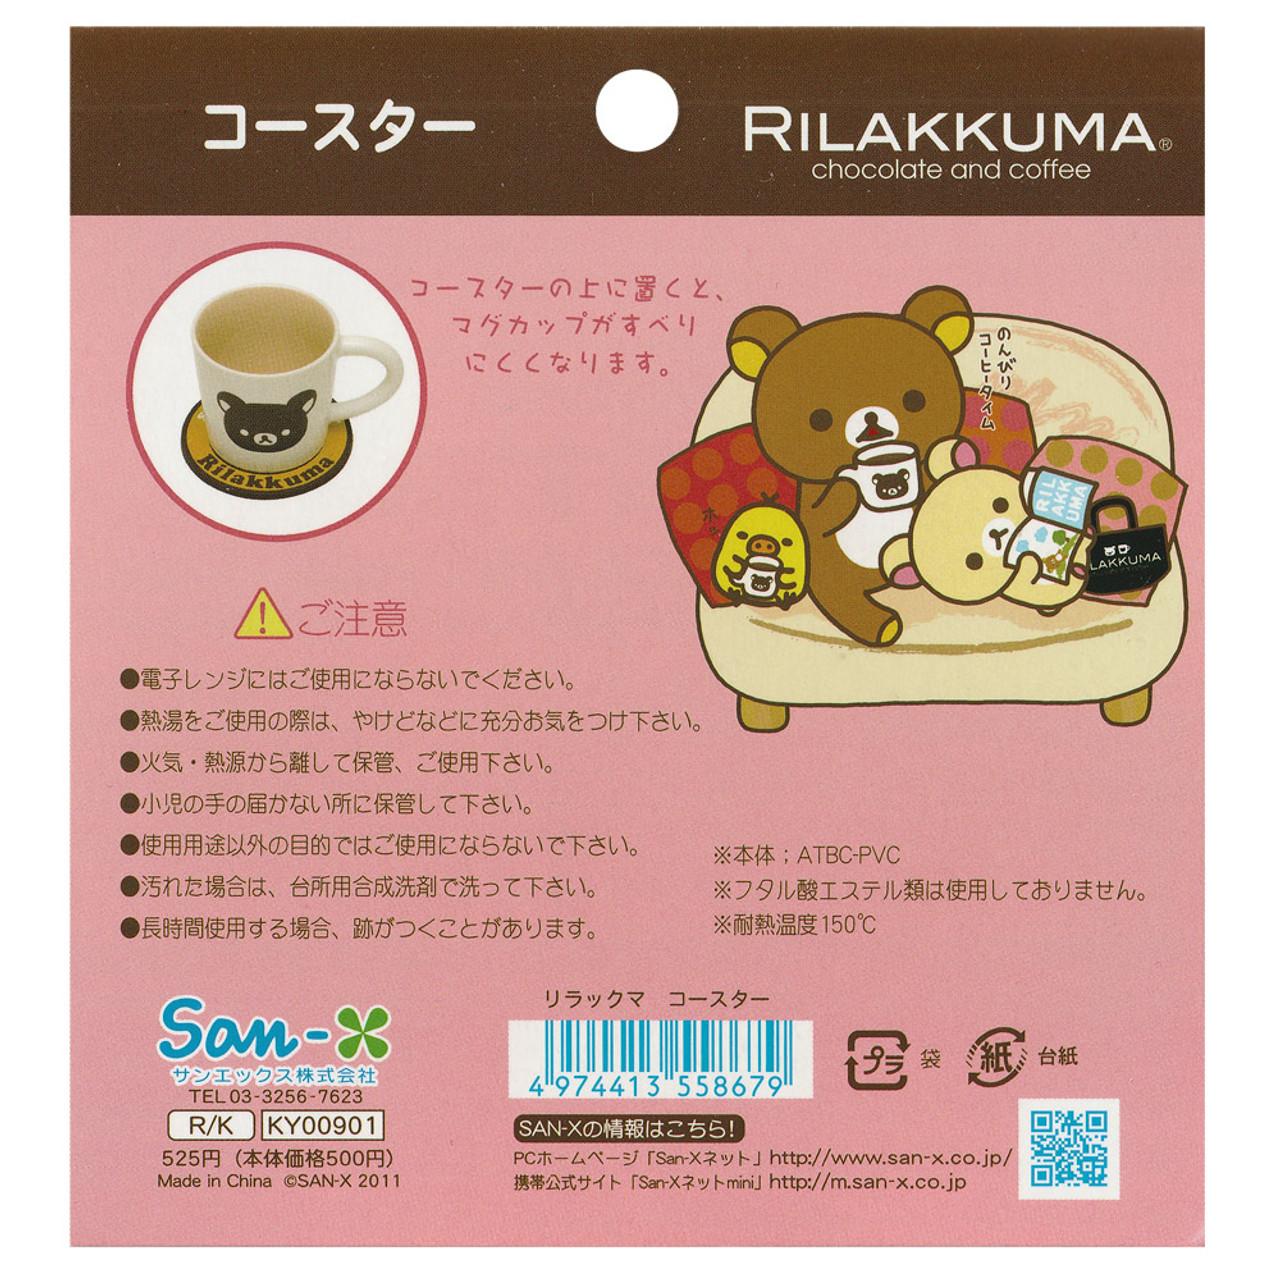 San-x Rilakkuma Circle Chocolate Coffee Mug Coaster - KY00901 ( Packing Back View )